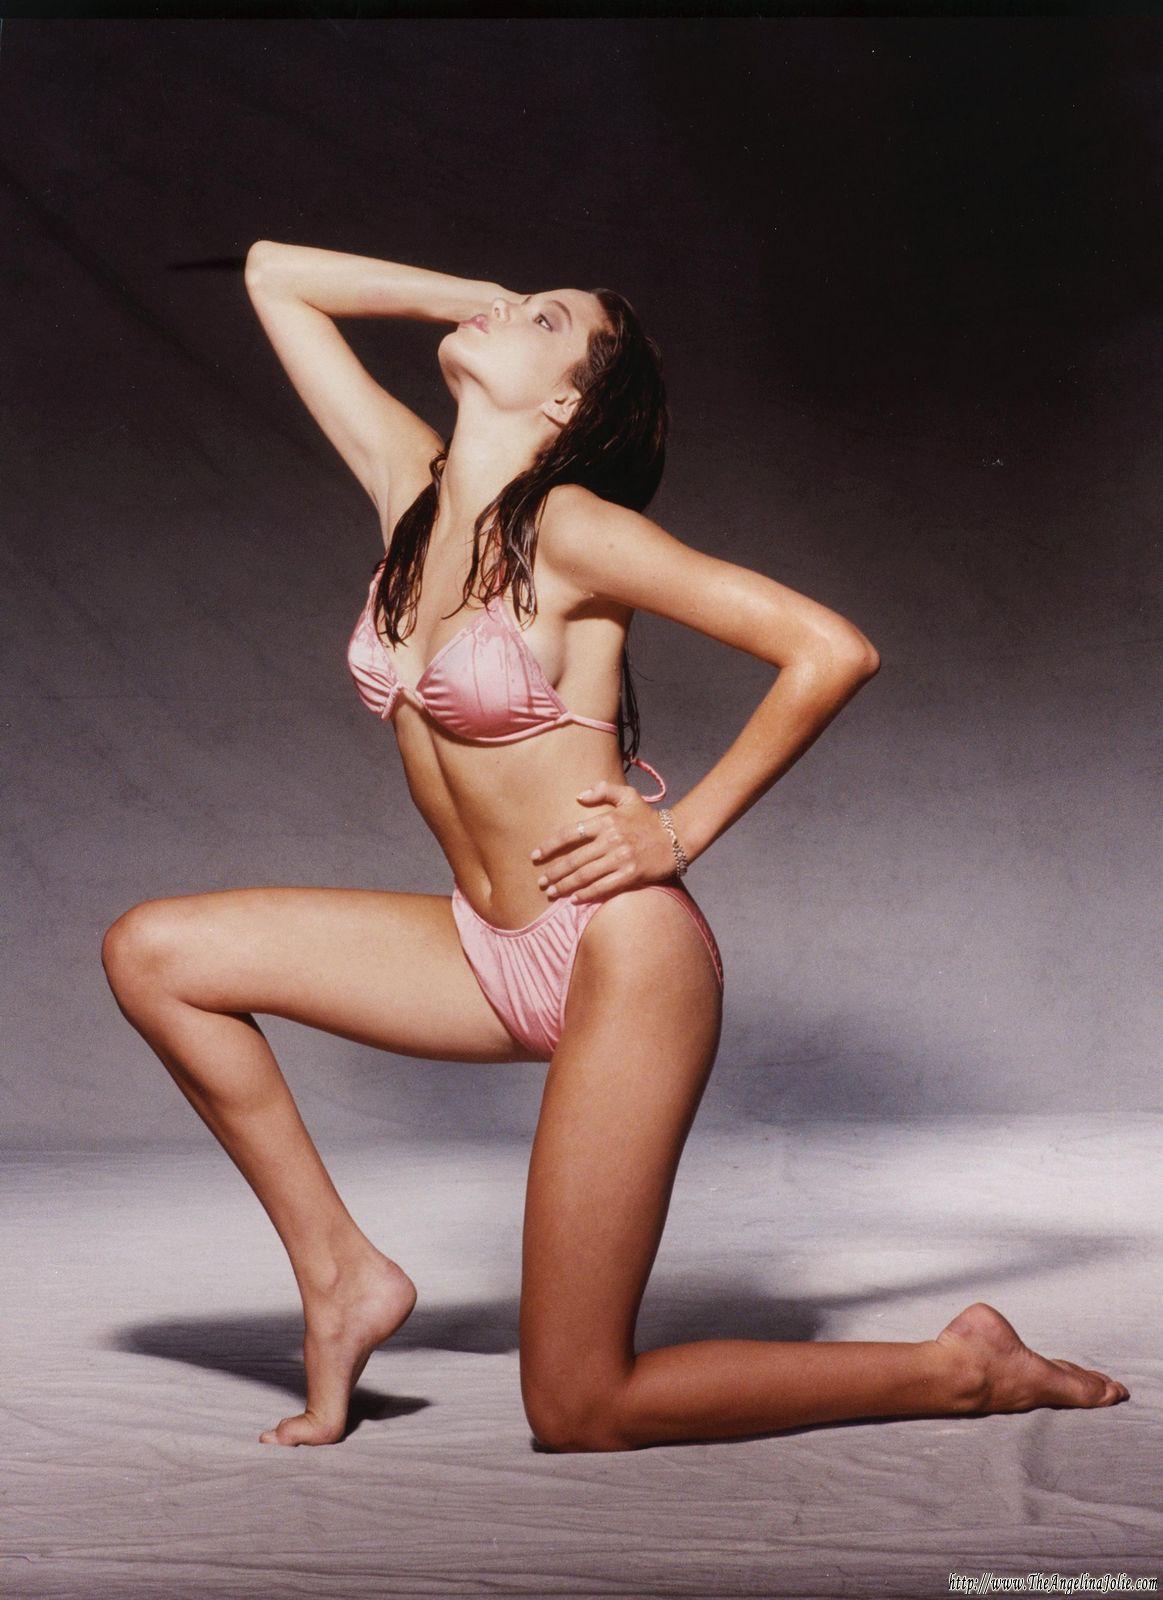 Angelina image jolie sexy